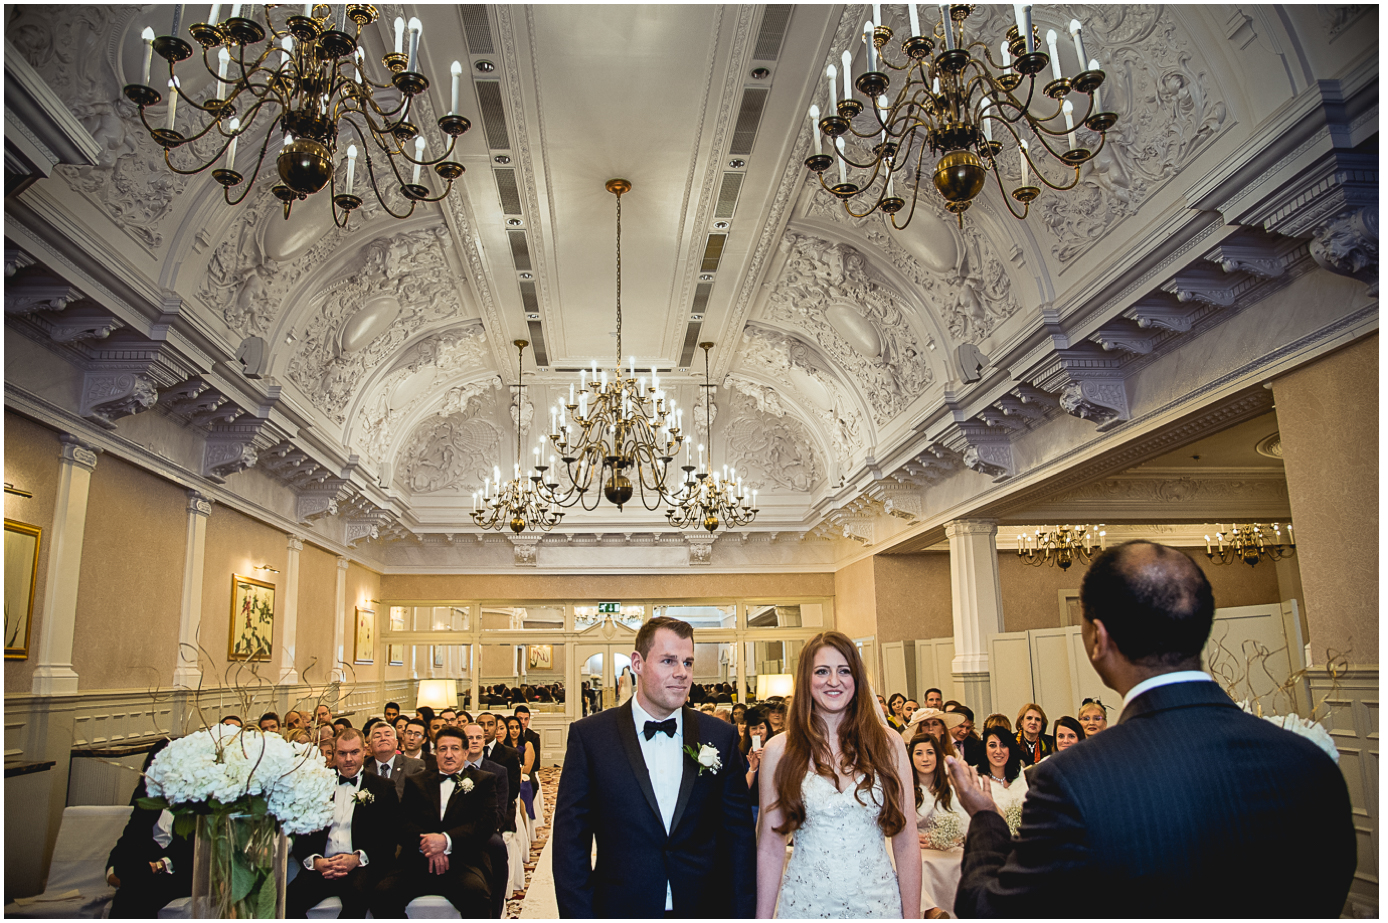 36 - Esmat and Angus - St. Ermin's Hotel London wedding photographer